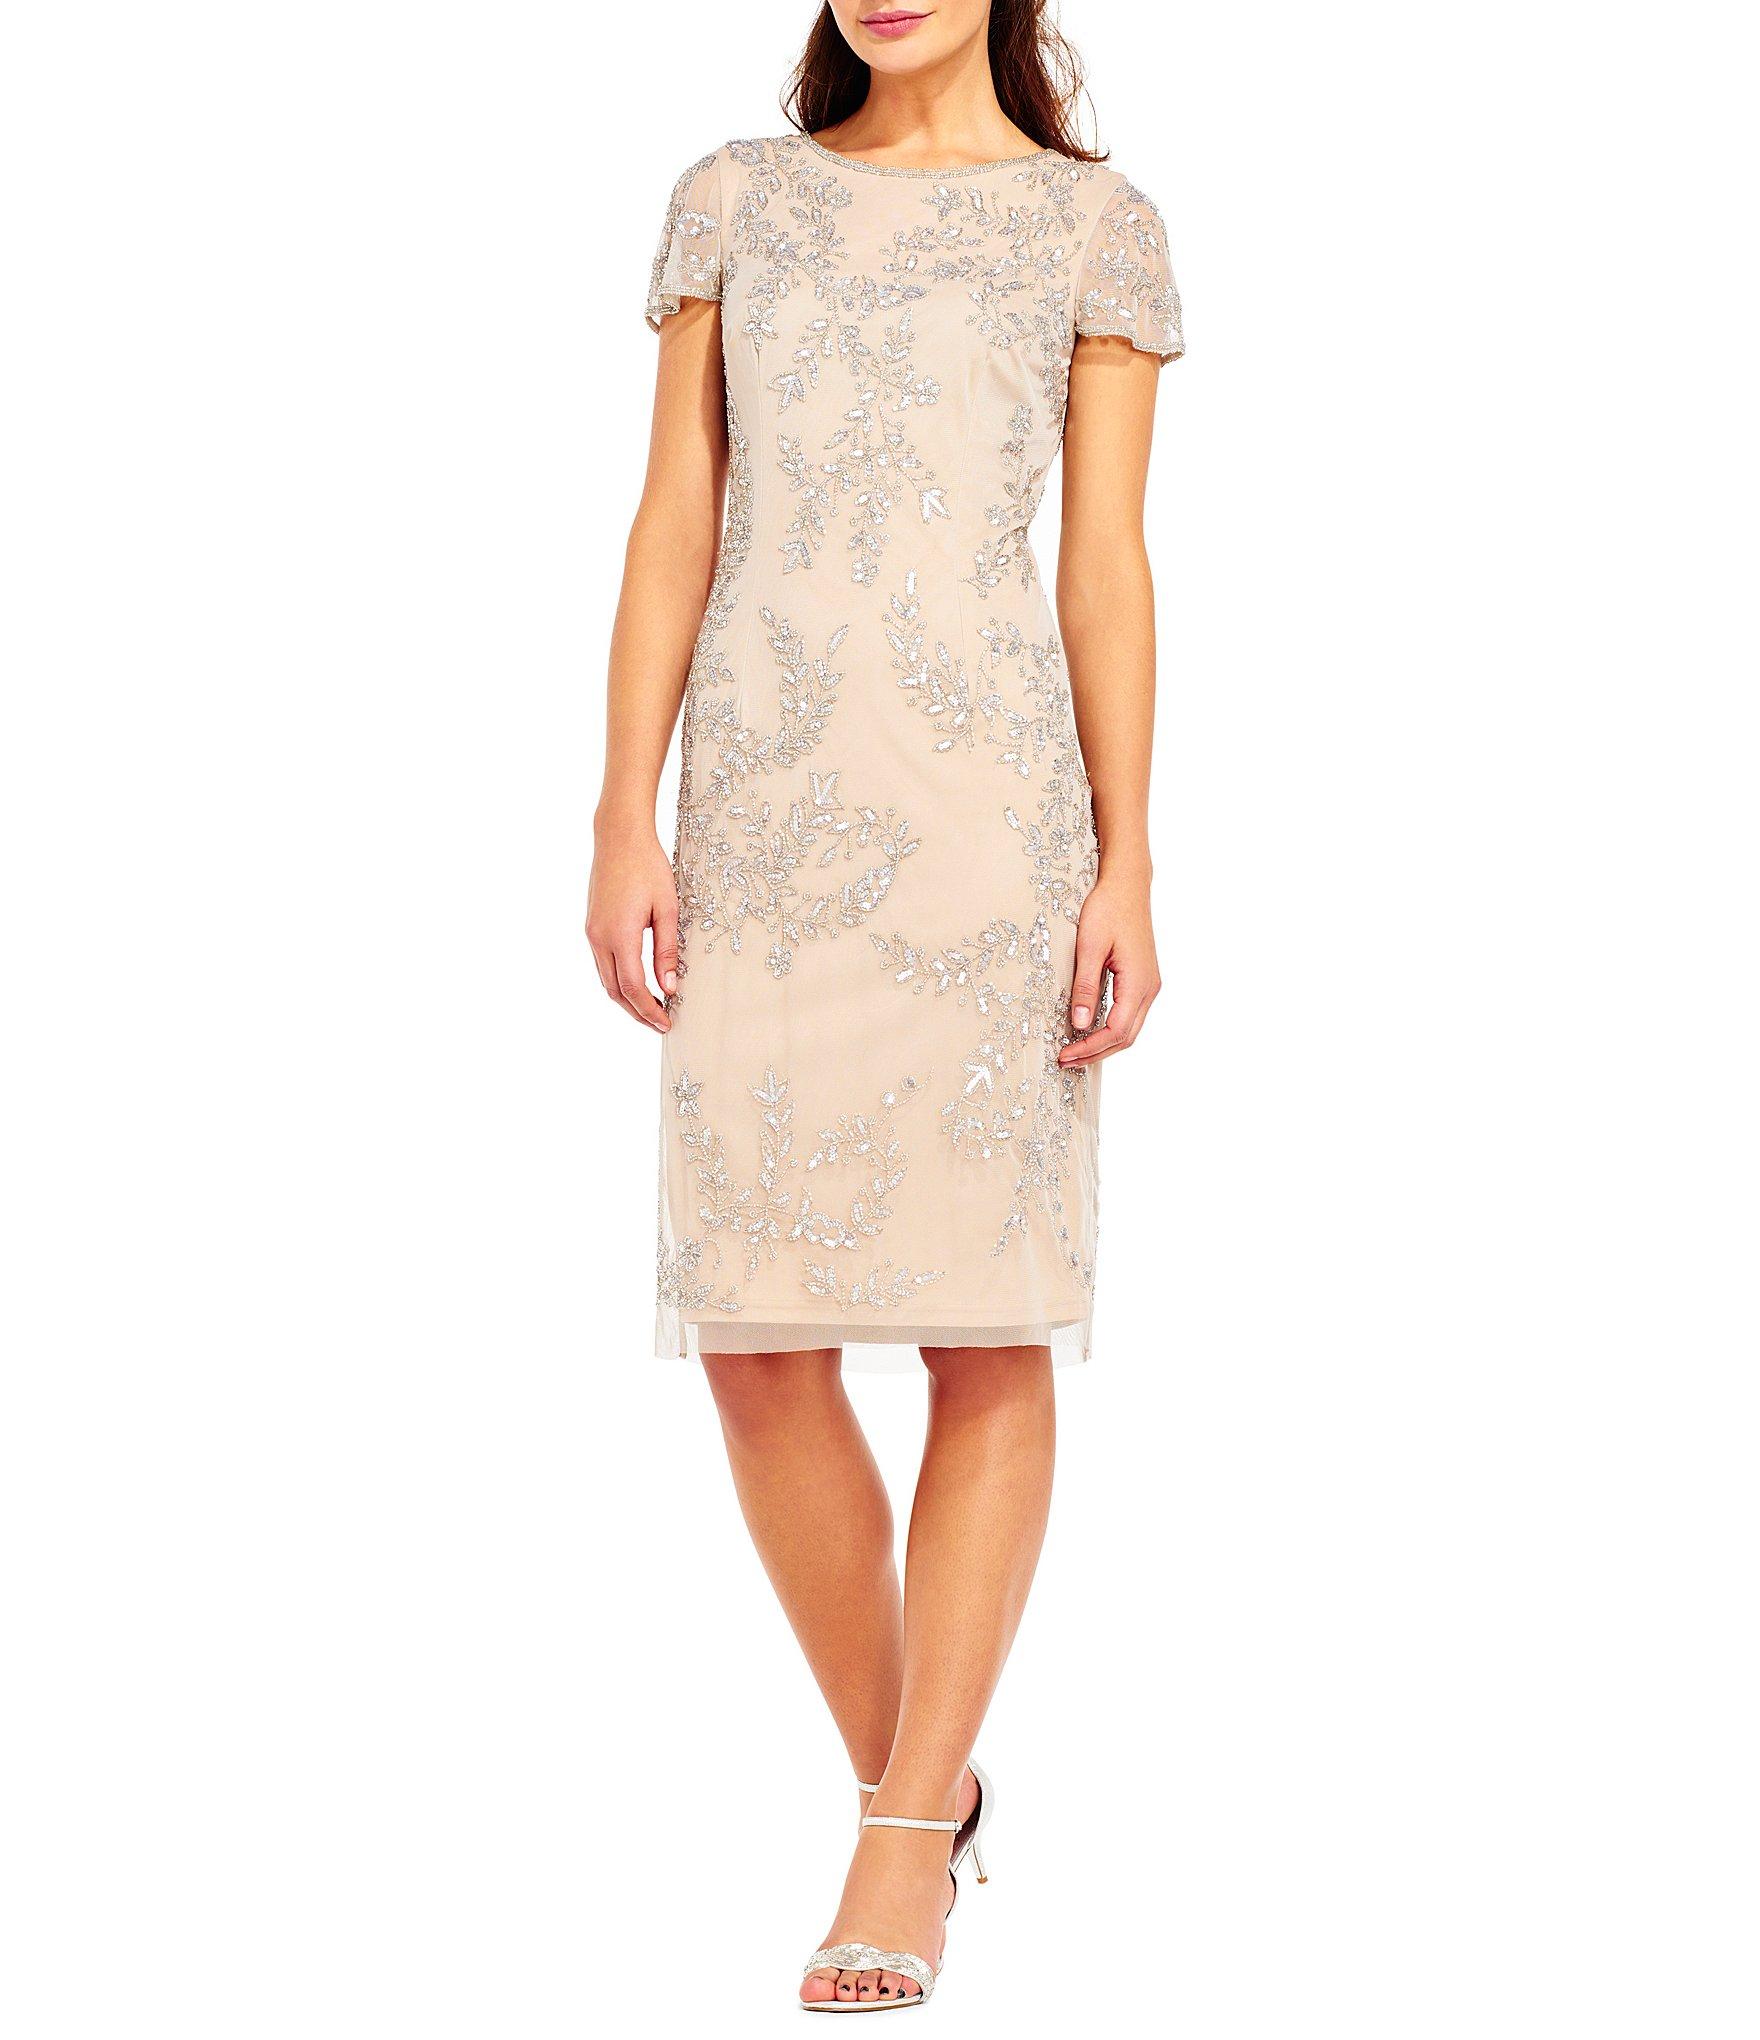 Women\'s Cocktail & Party Dresses | Dillards